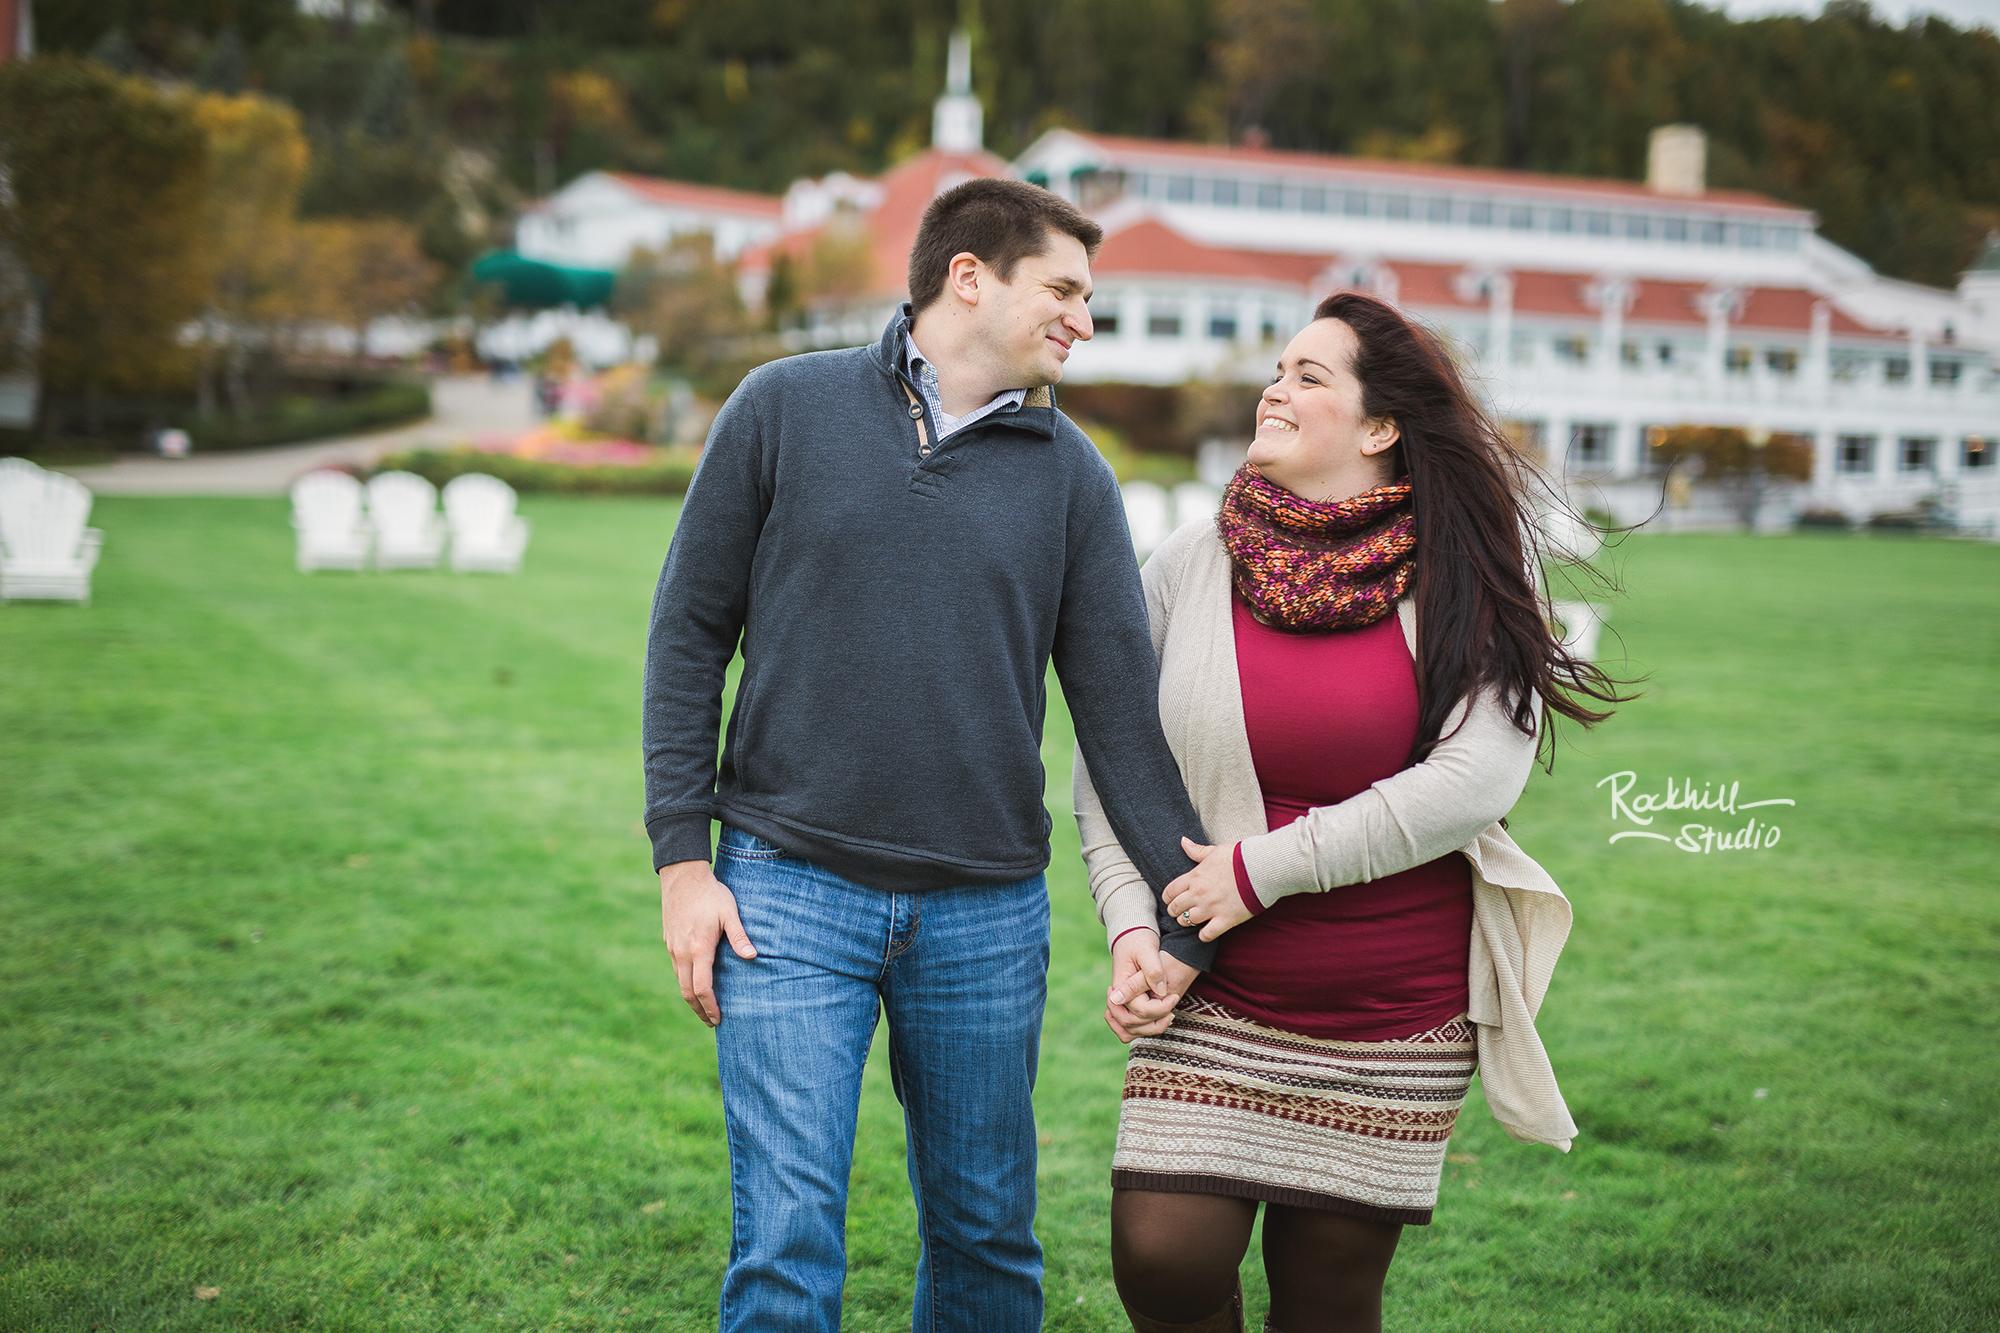 mackinac-island-wedding-engagement-michigan-rockhill-13.jpg